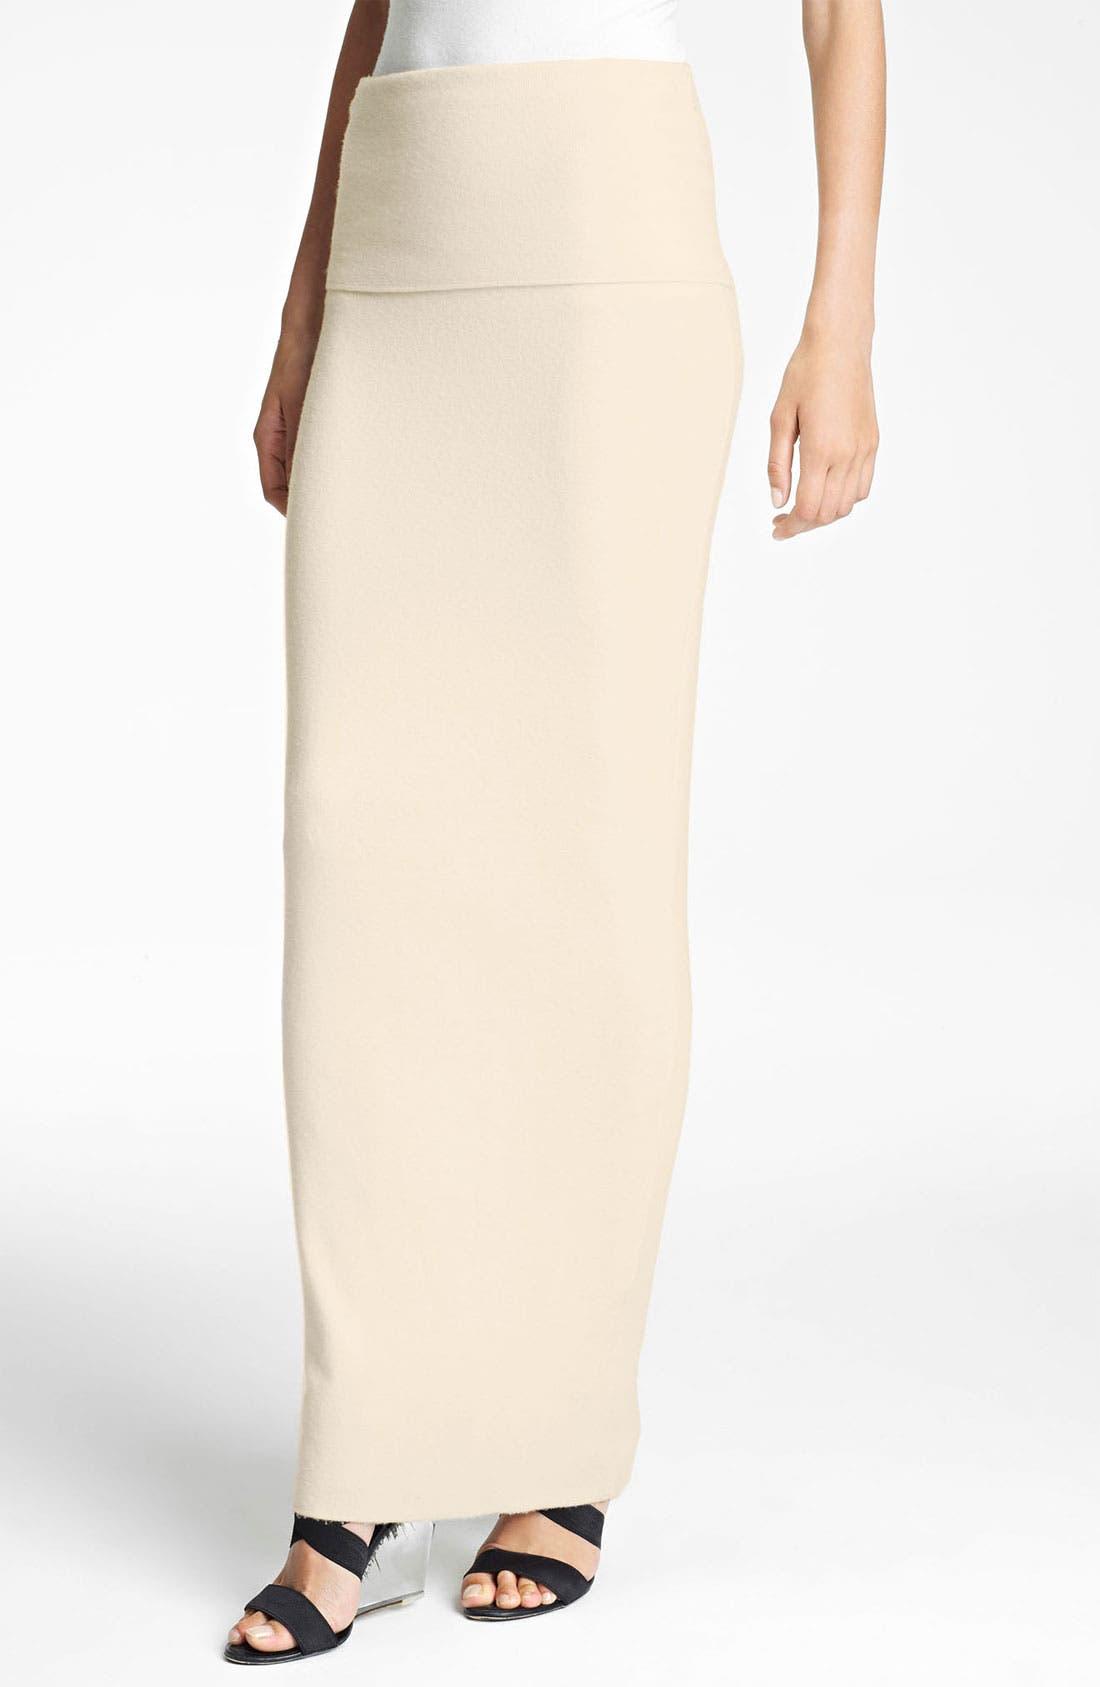 Alternate Image 1 Selected - Donna Karan Collection 'First Layer' Cashmere Blend Maxi Skirt